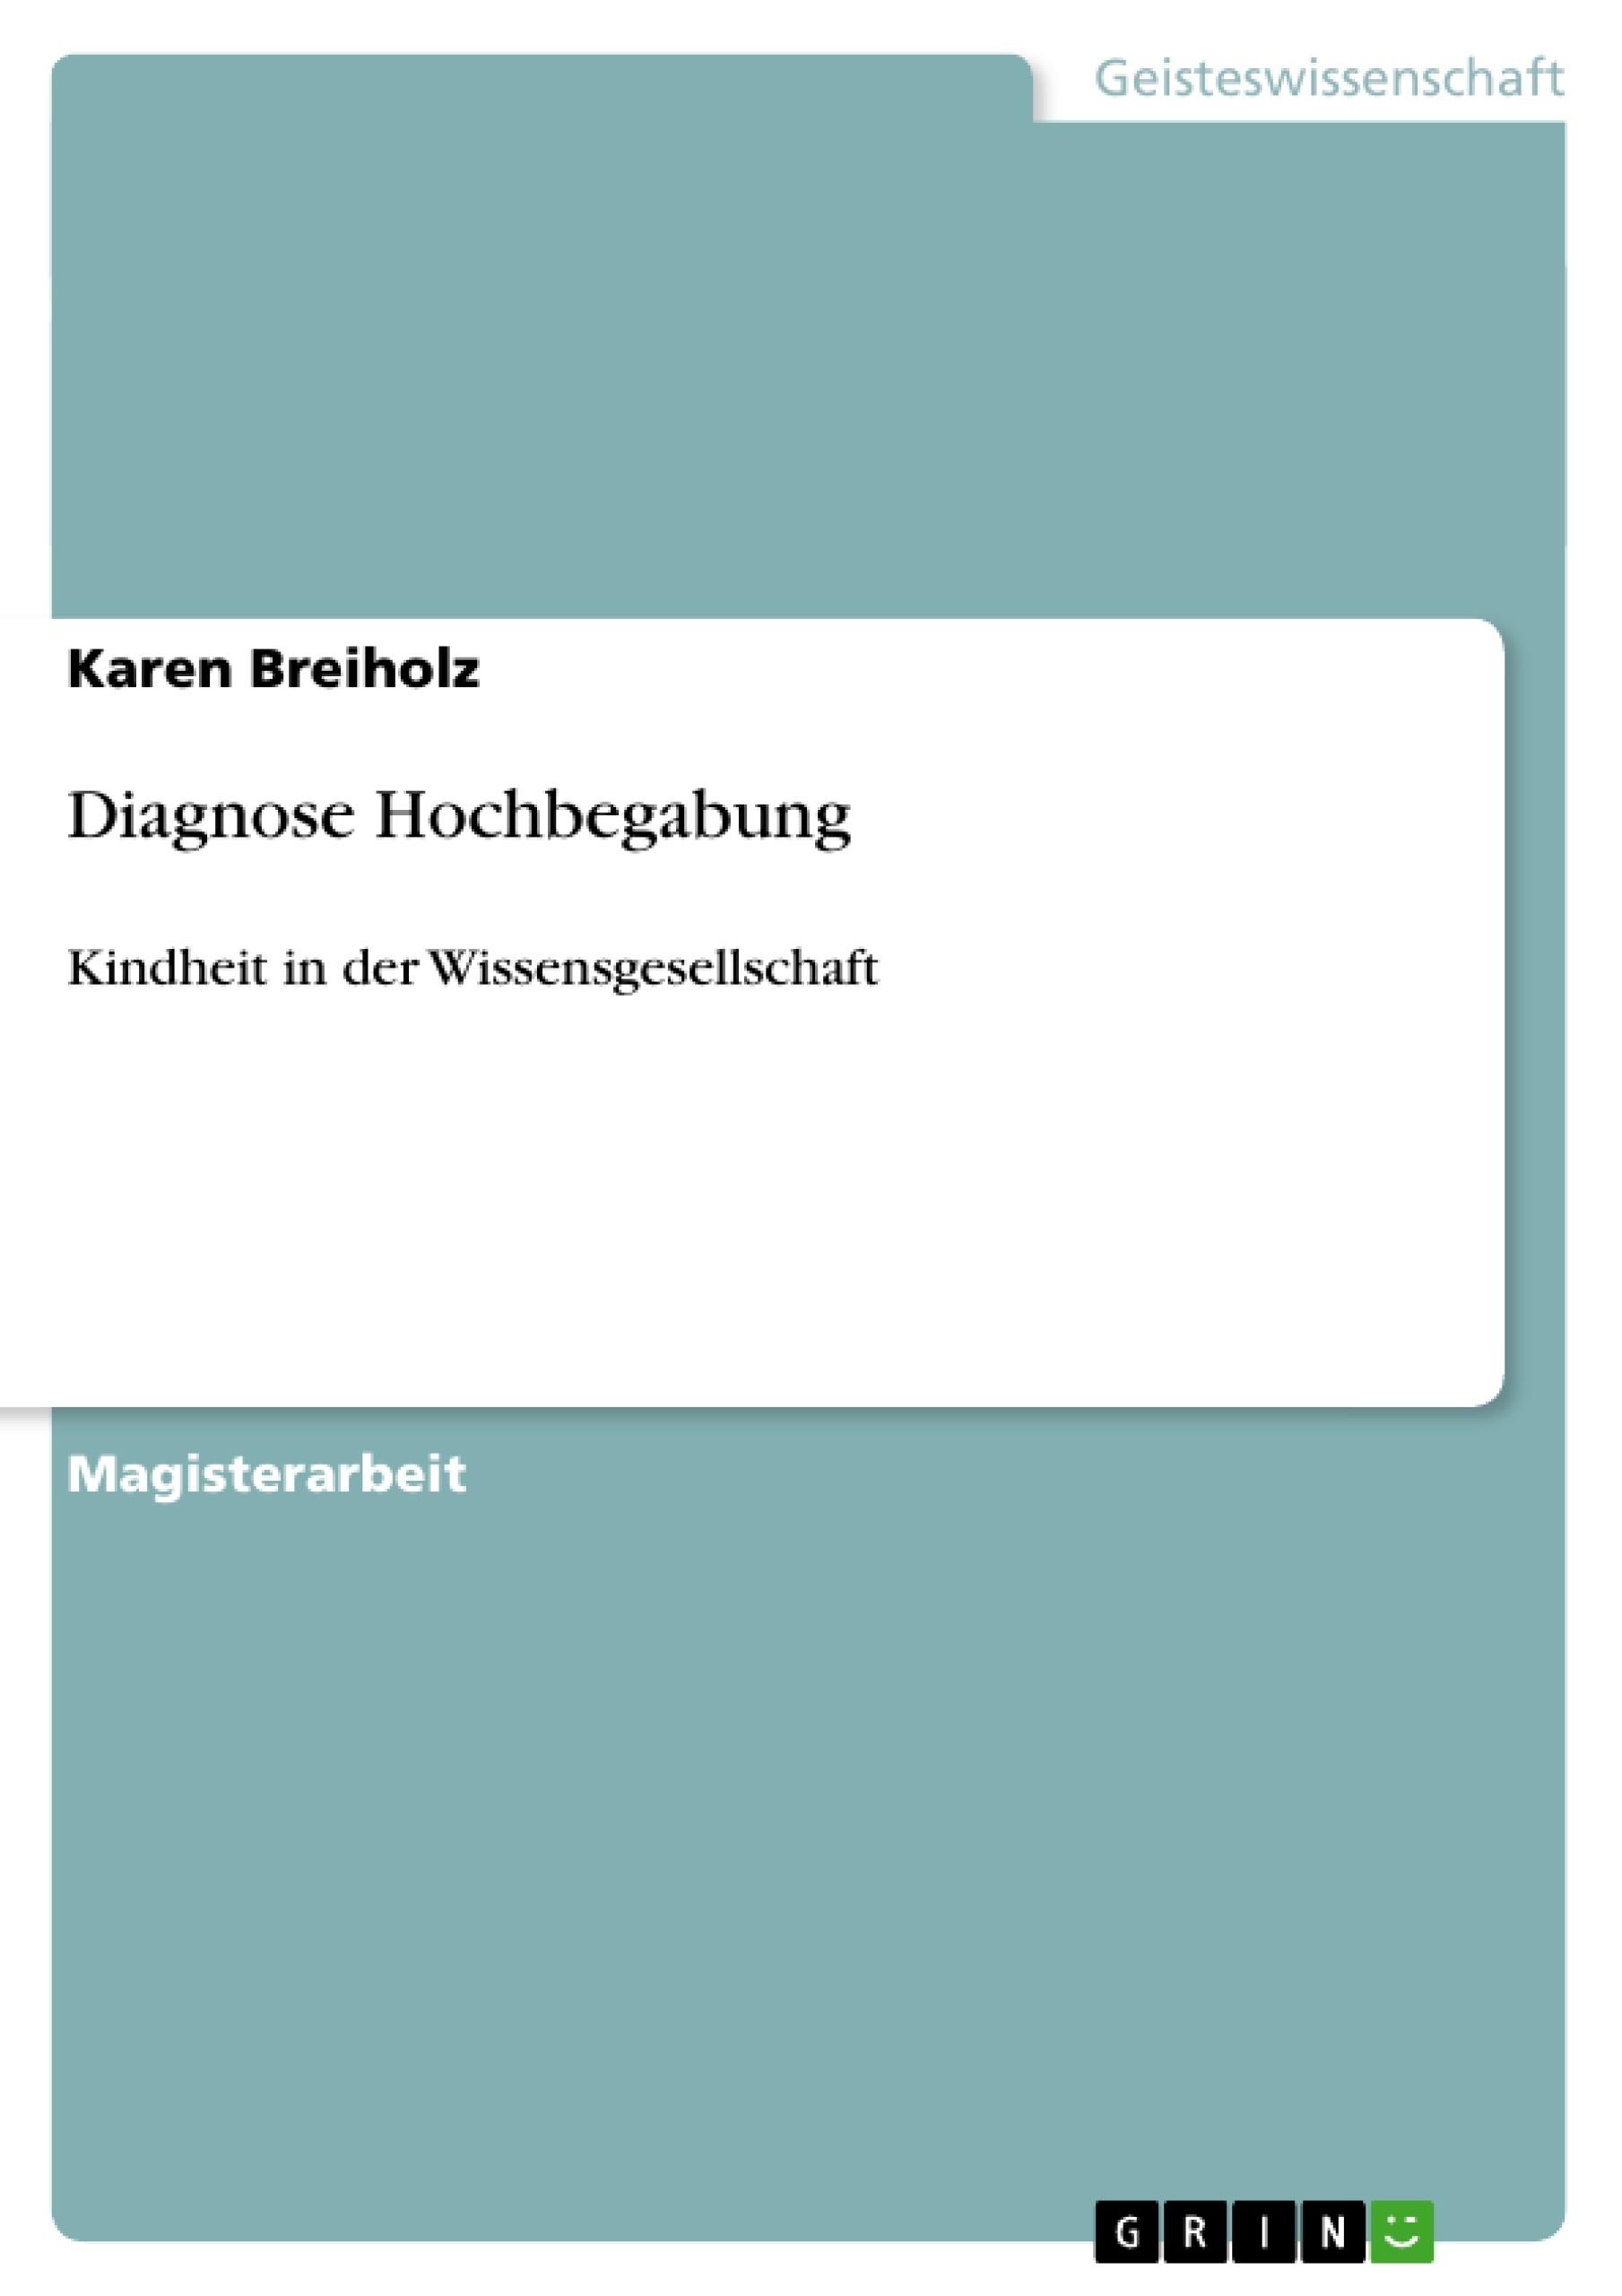 Titel: Diagnose Hochbegabung